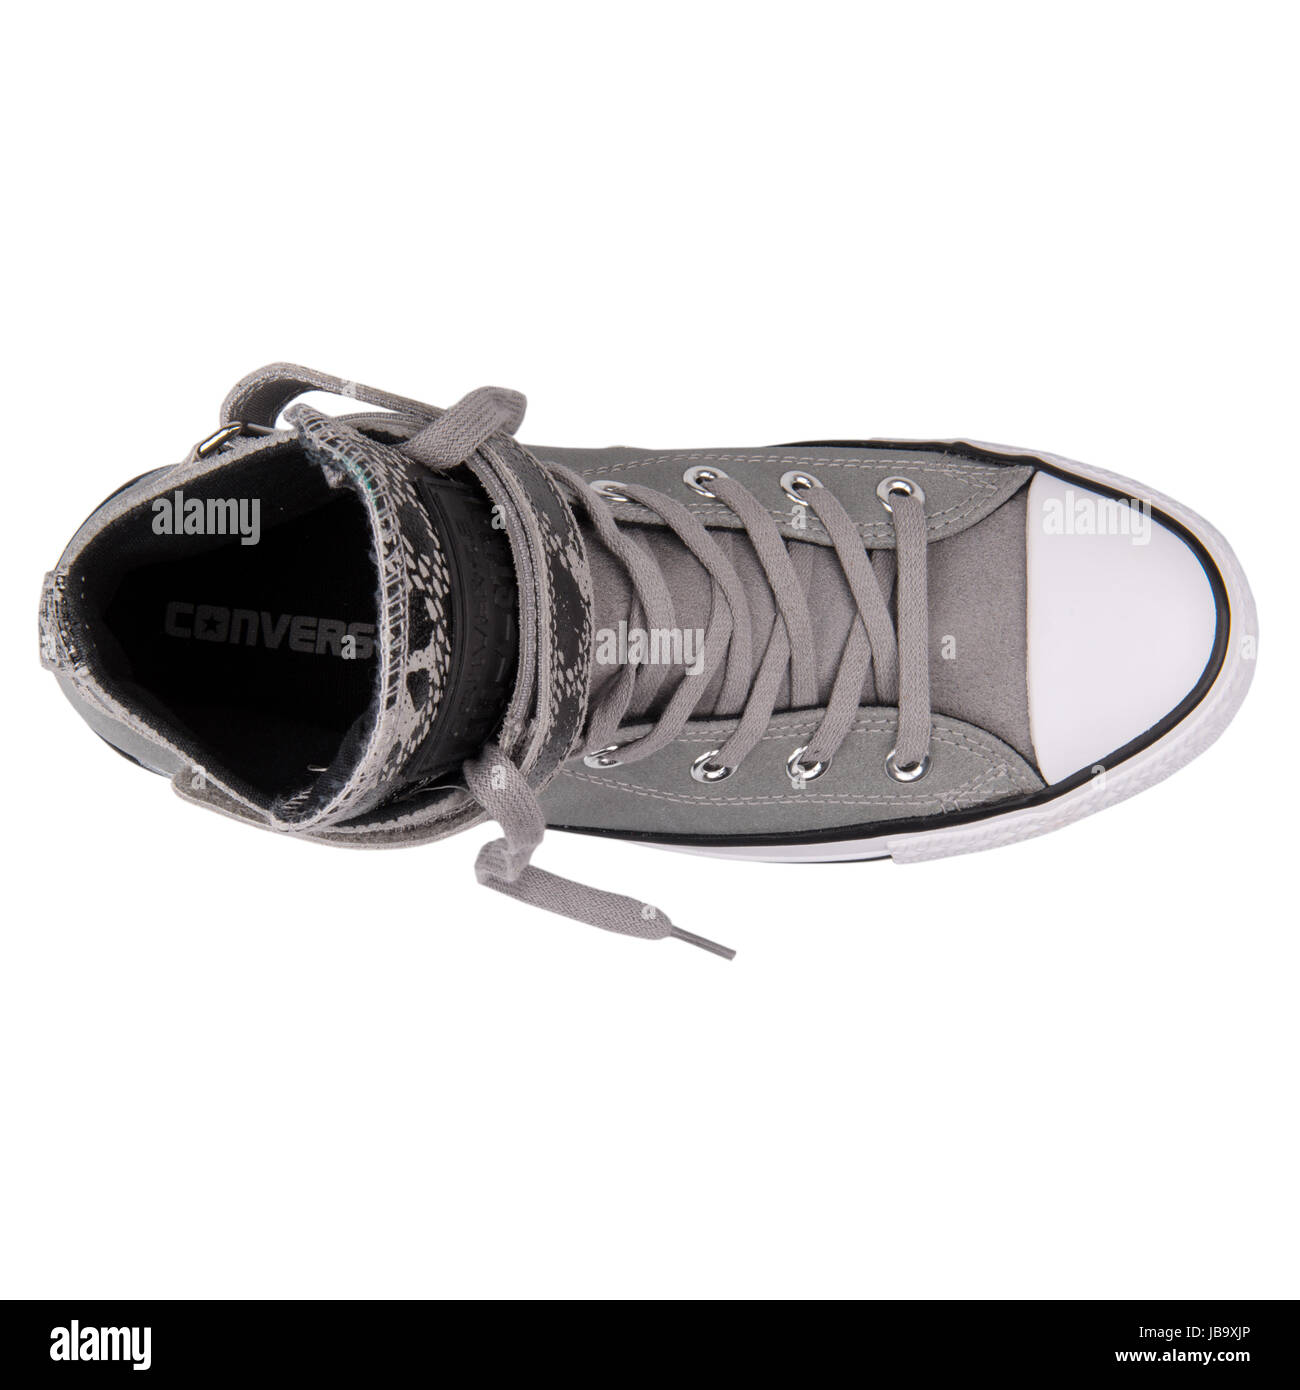 b0427d6cc Converse Chuck Taylor All Star Hi Brea delfín negro zapatos de mujer -  549581C